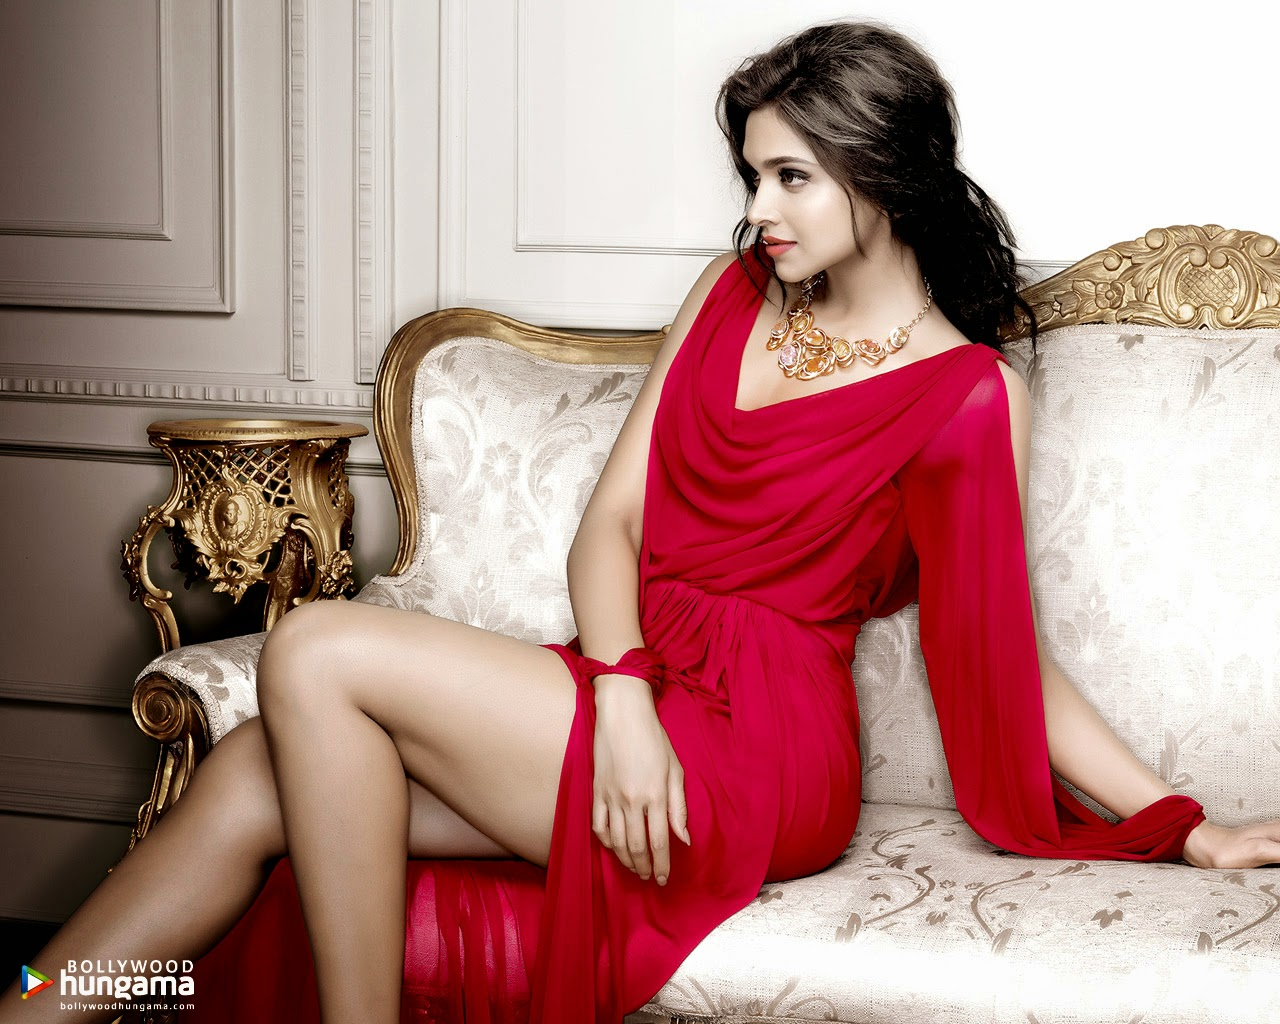 Deepika Padukone Wallpapers: Deepika Padukone Smooth Legs